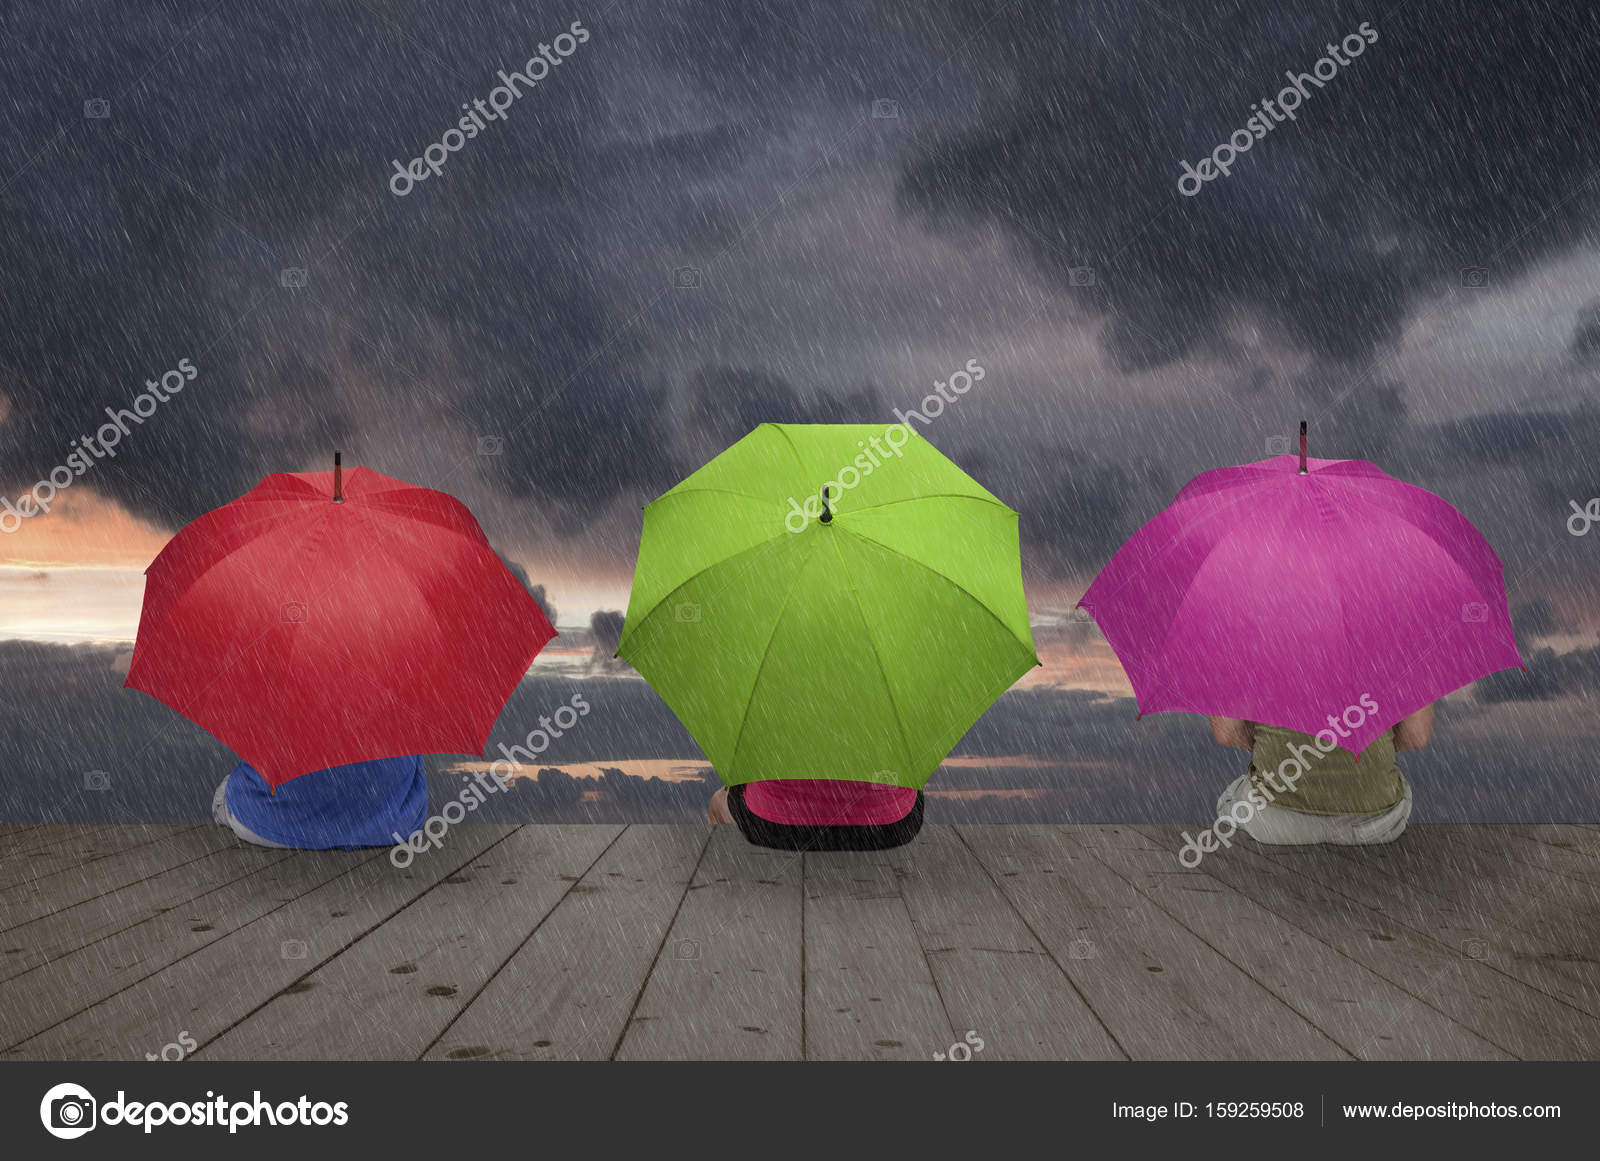 79494c9058 Drei Personen sind unter Sonnenschirmen gegen den Regen versteckt.